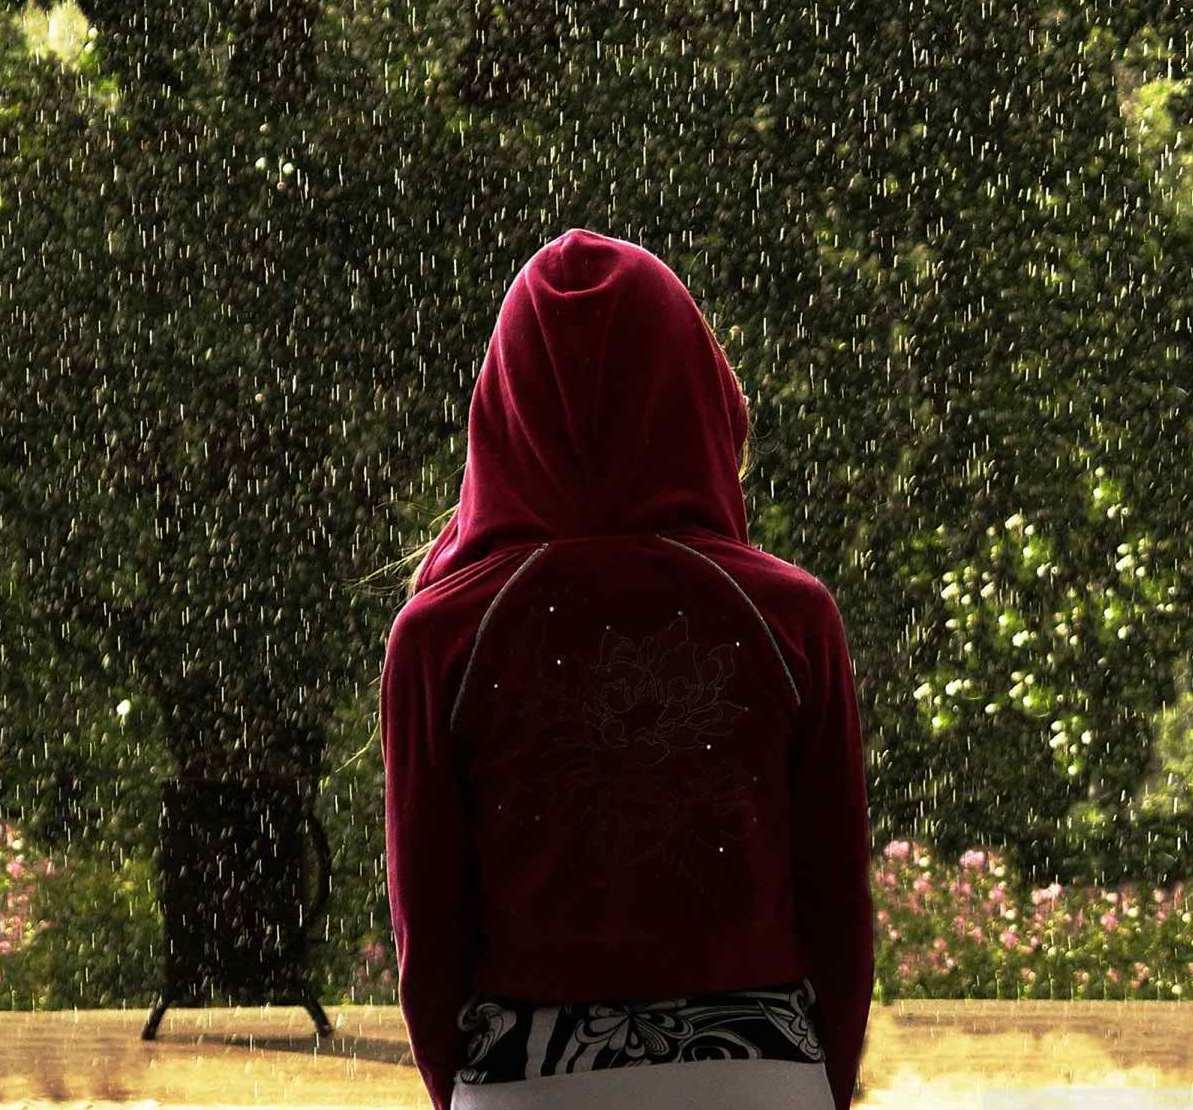 Sad Wallpaper Full Hd Girl In Rain Profile Dp For Whatsapp And Facebook